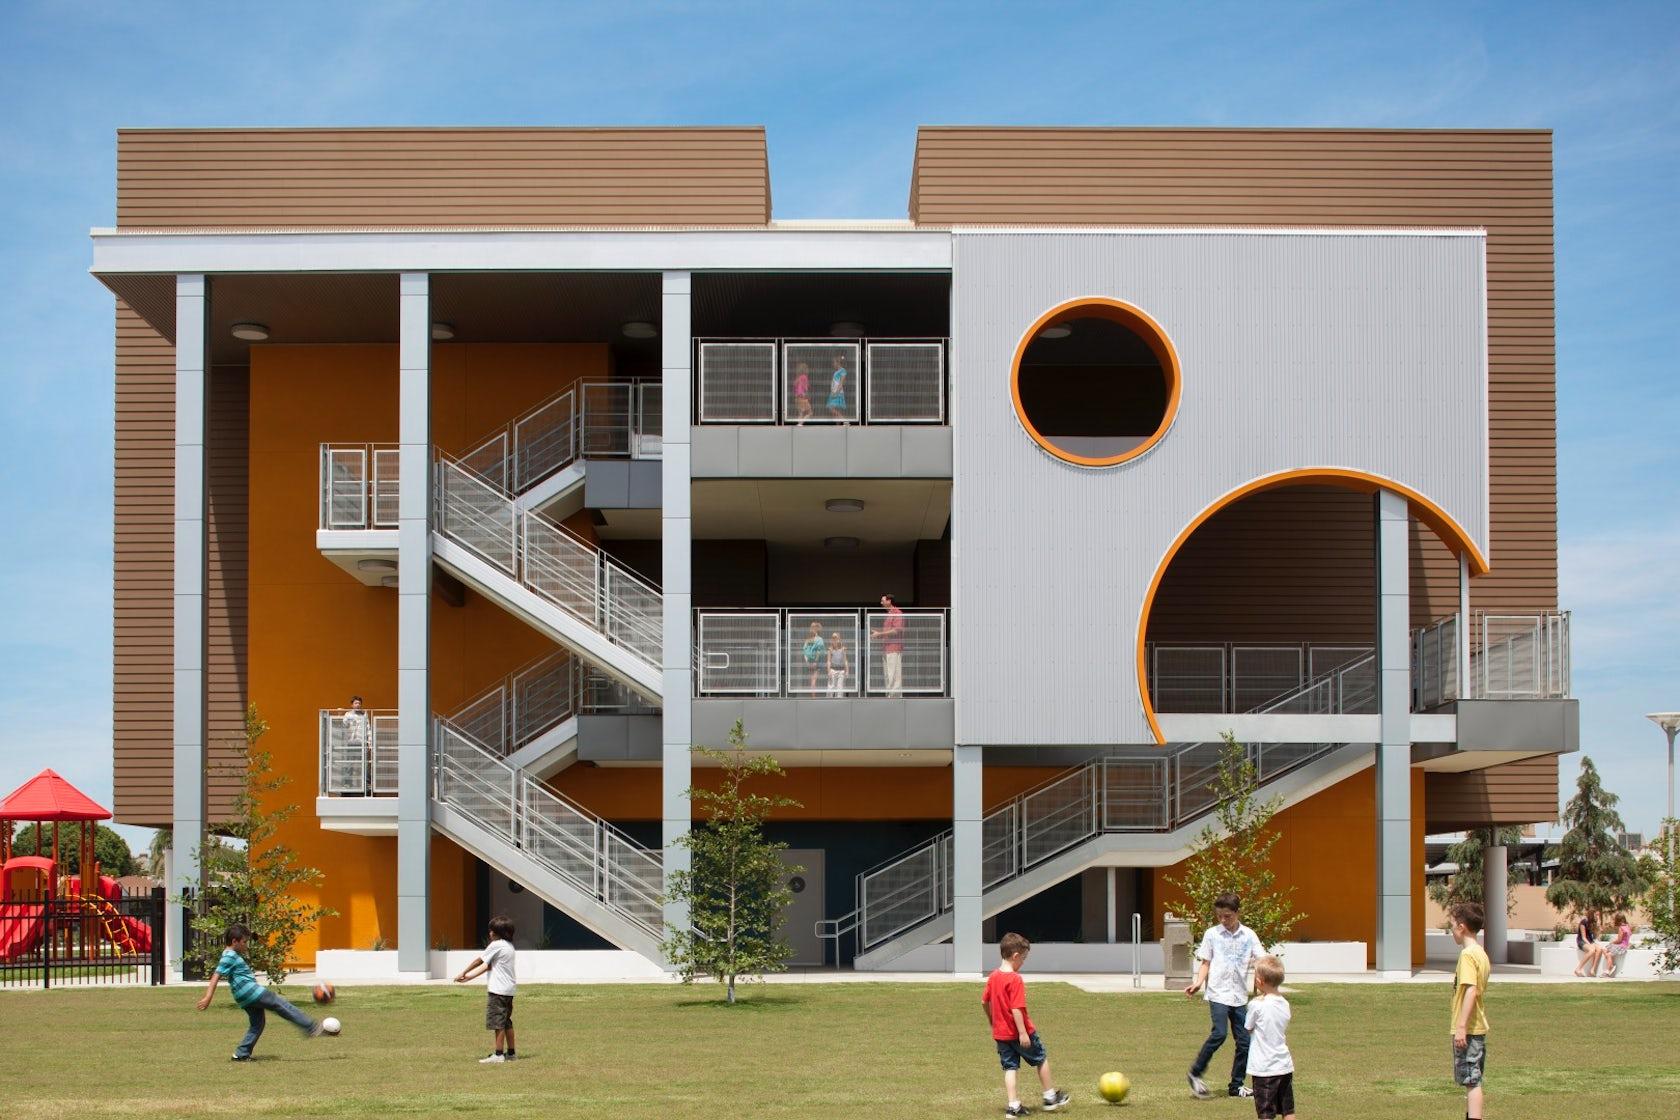 Elementary School Classroom Design Standards ~ South region elementary school architizer